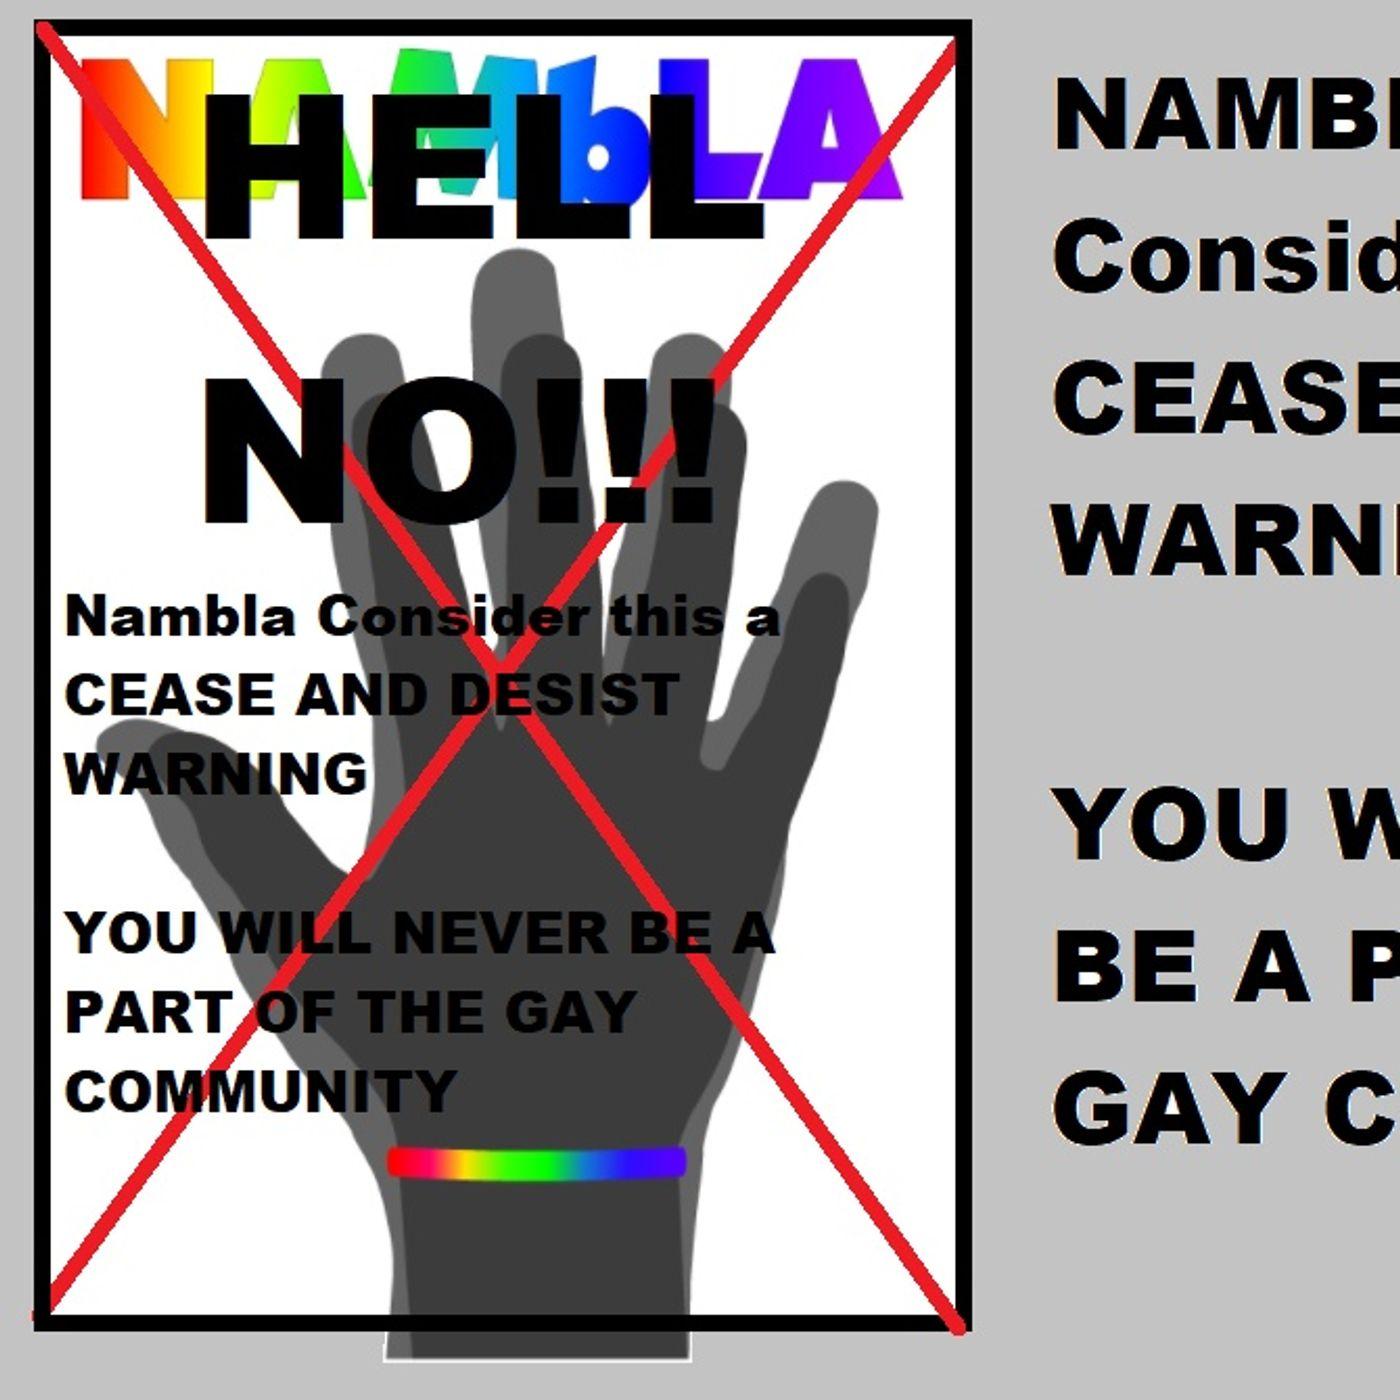 NAMBLA consider this a CEASE AND DESIST WARNING